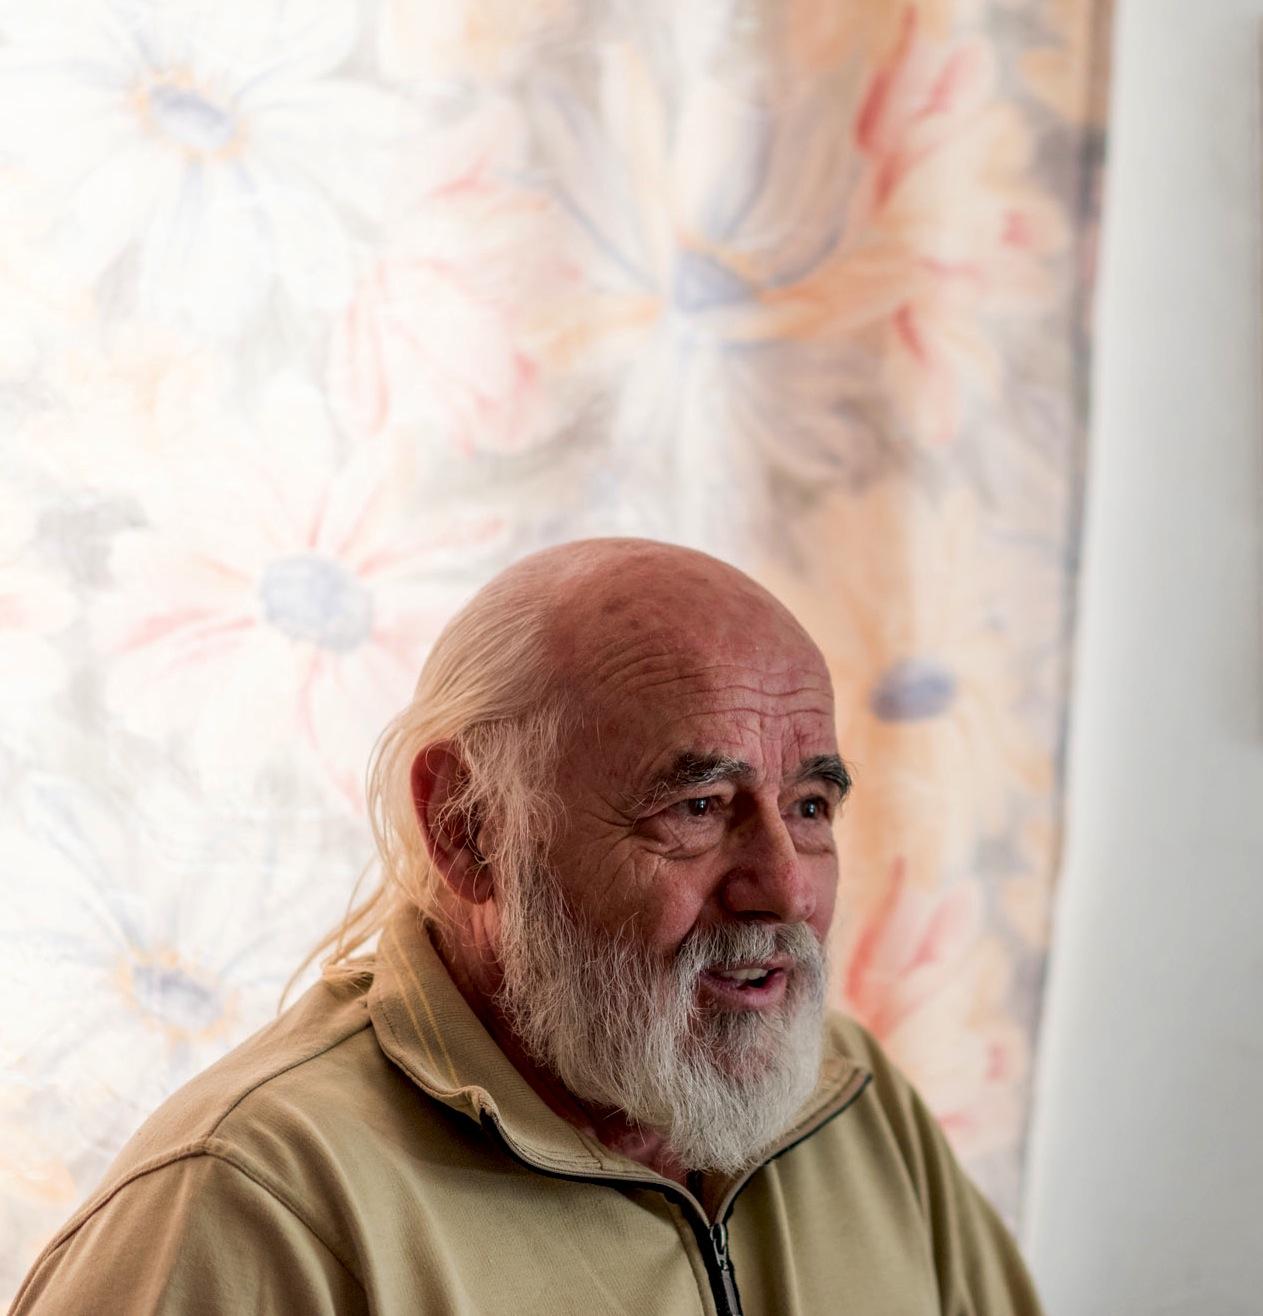 Emil Hidoș in February 2018